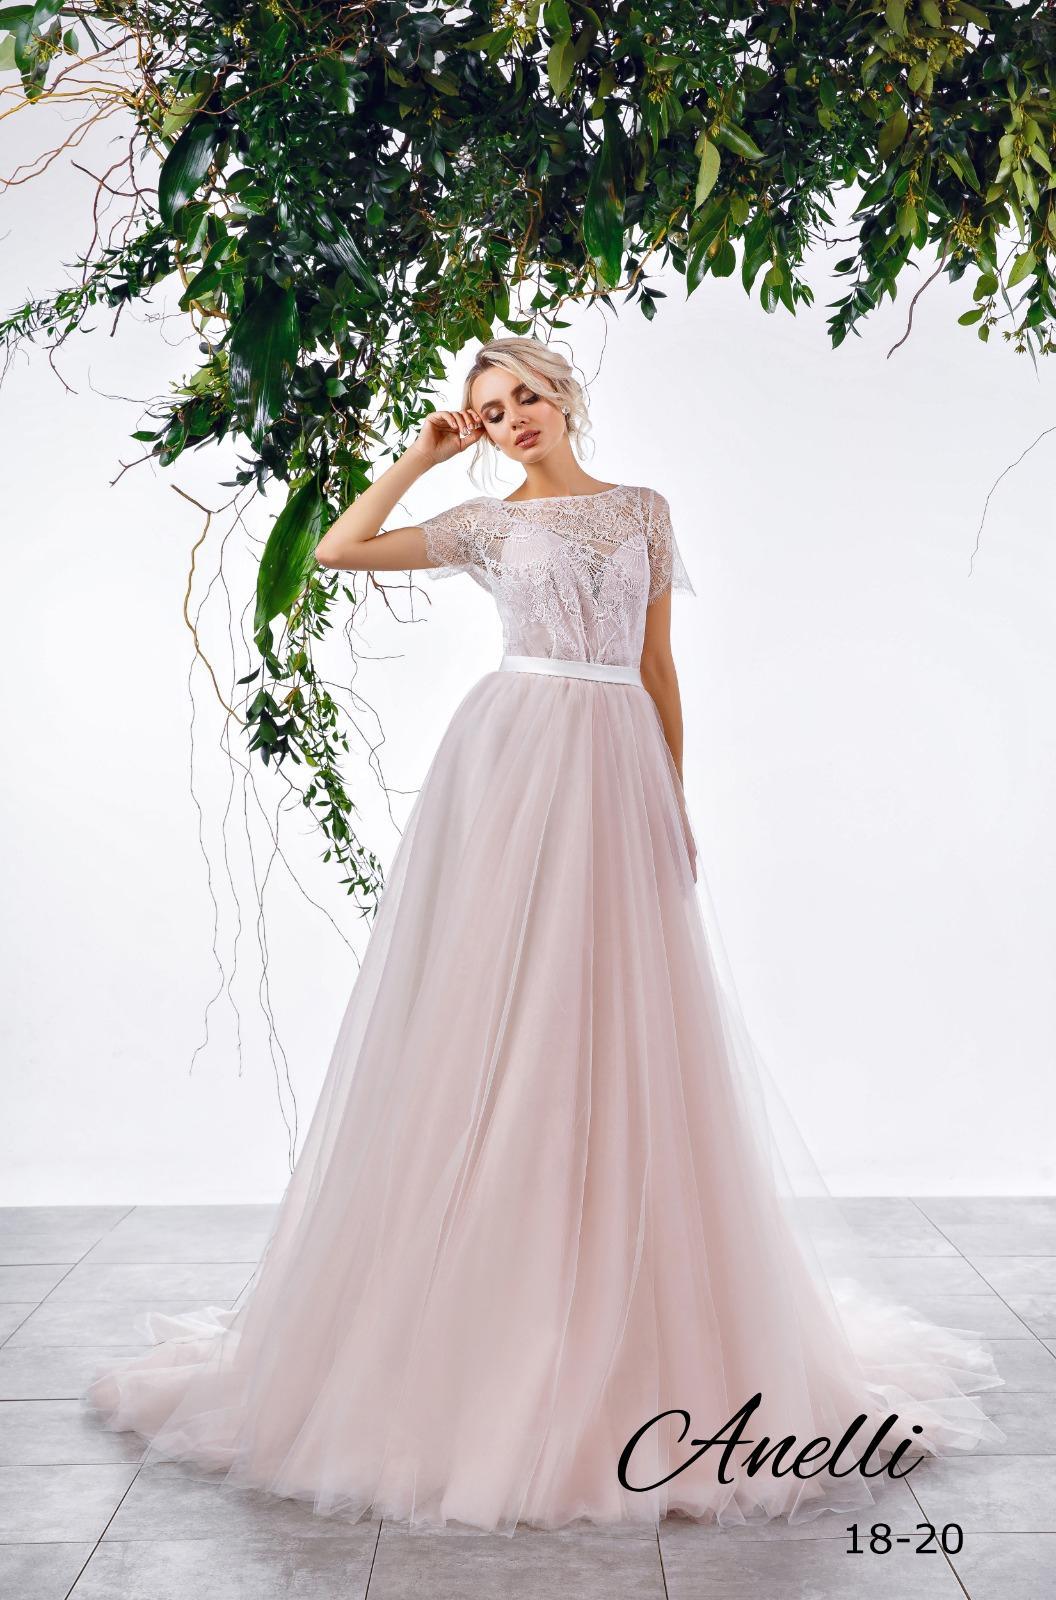 Svadobné šaty - Floral 1820 - Obrázok č. 1